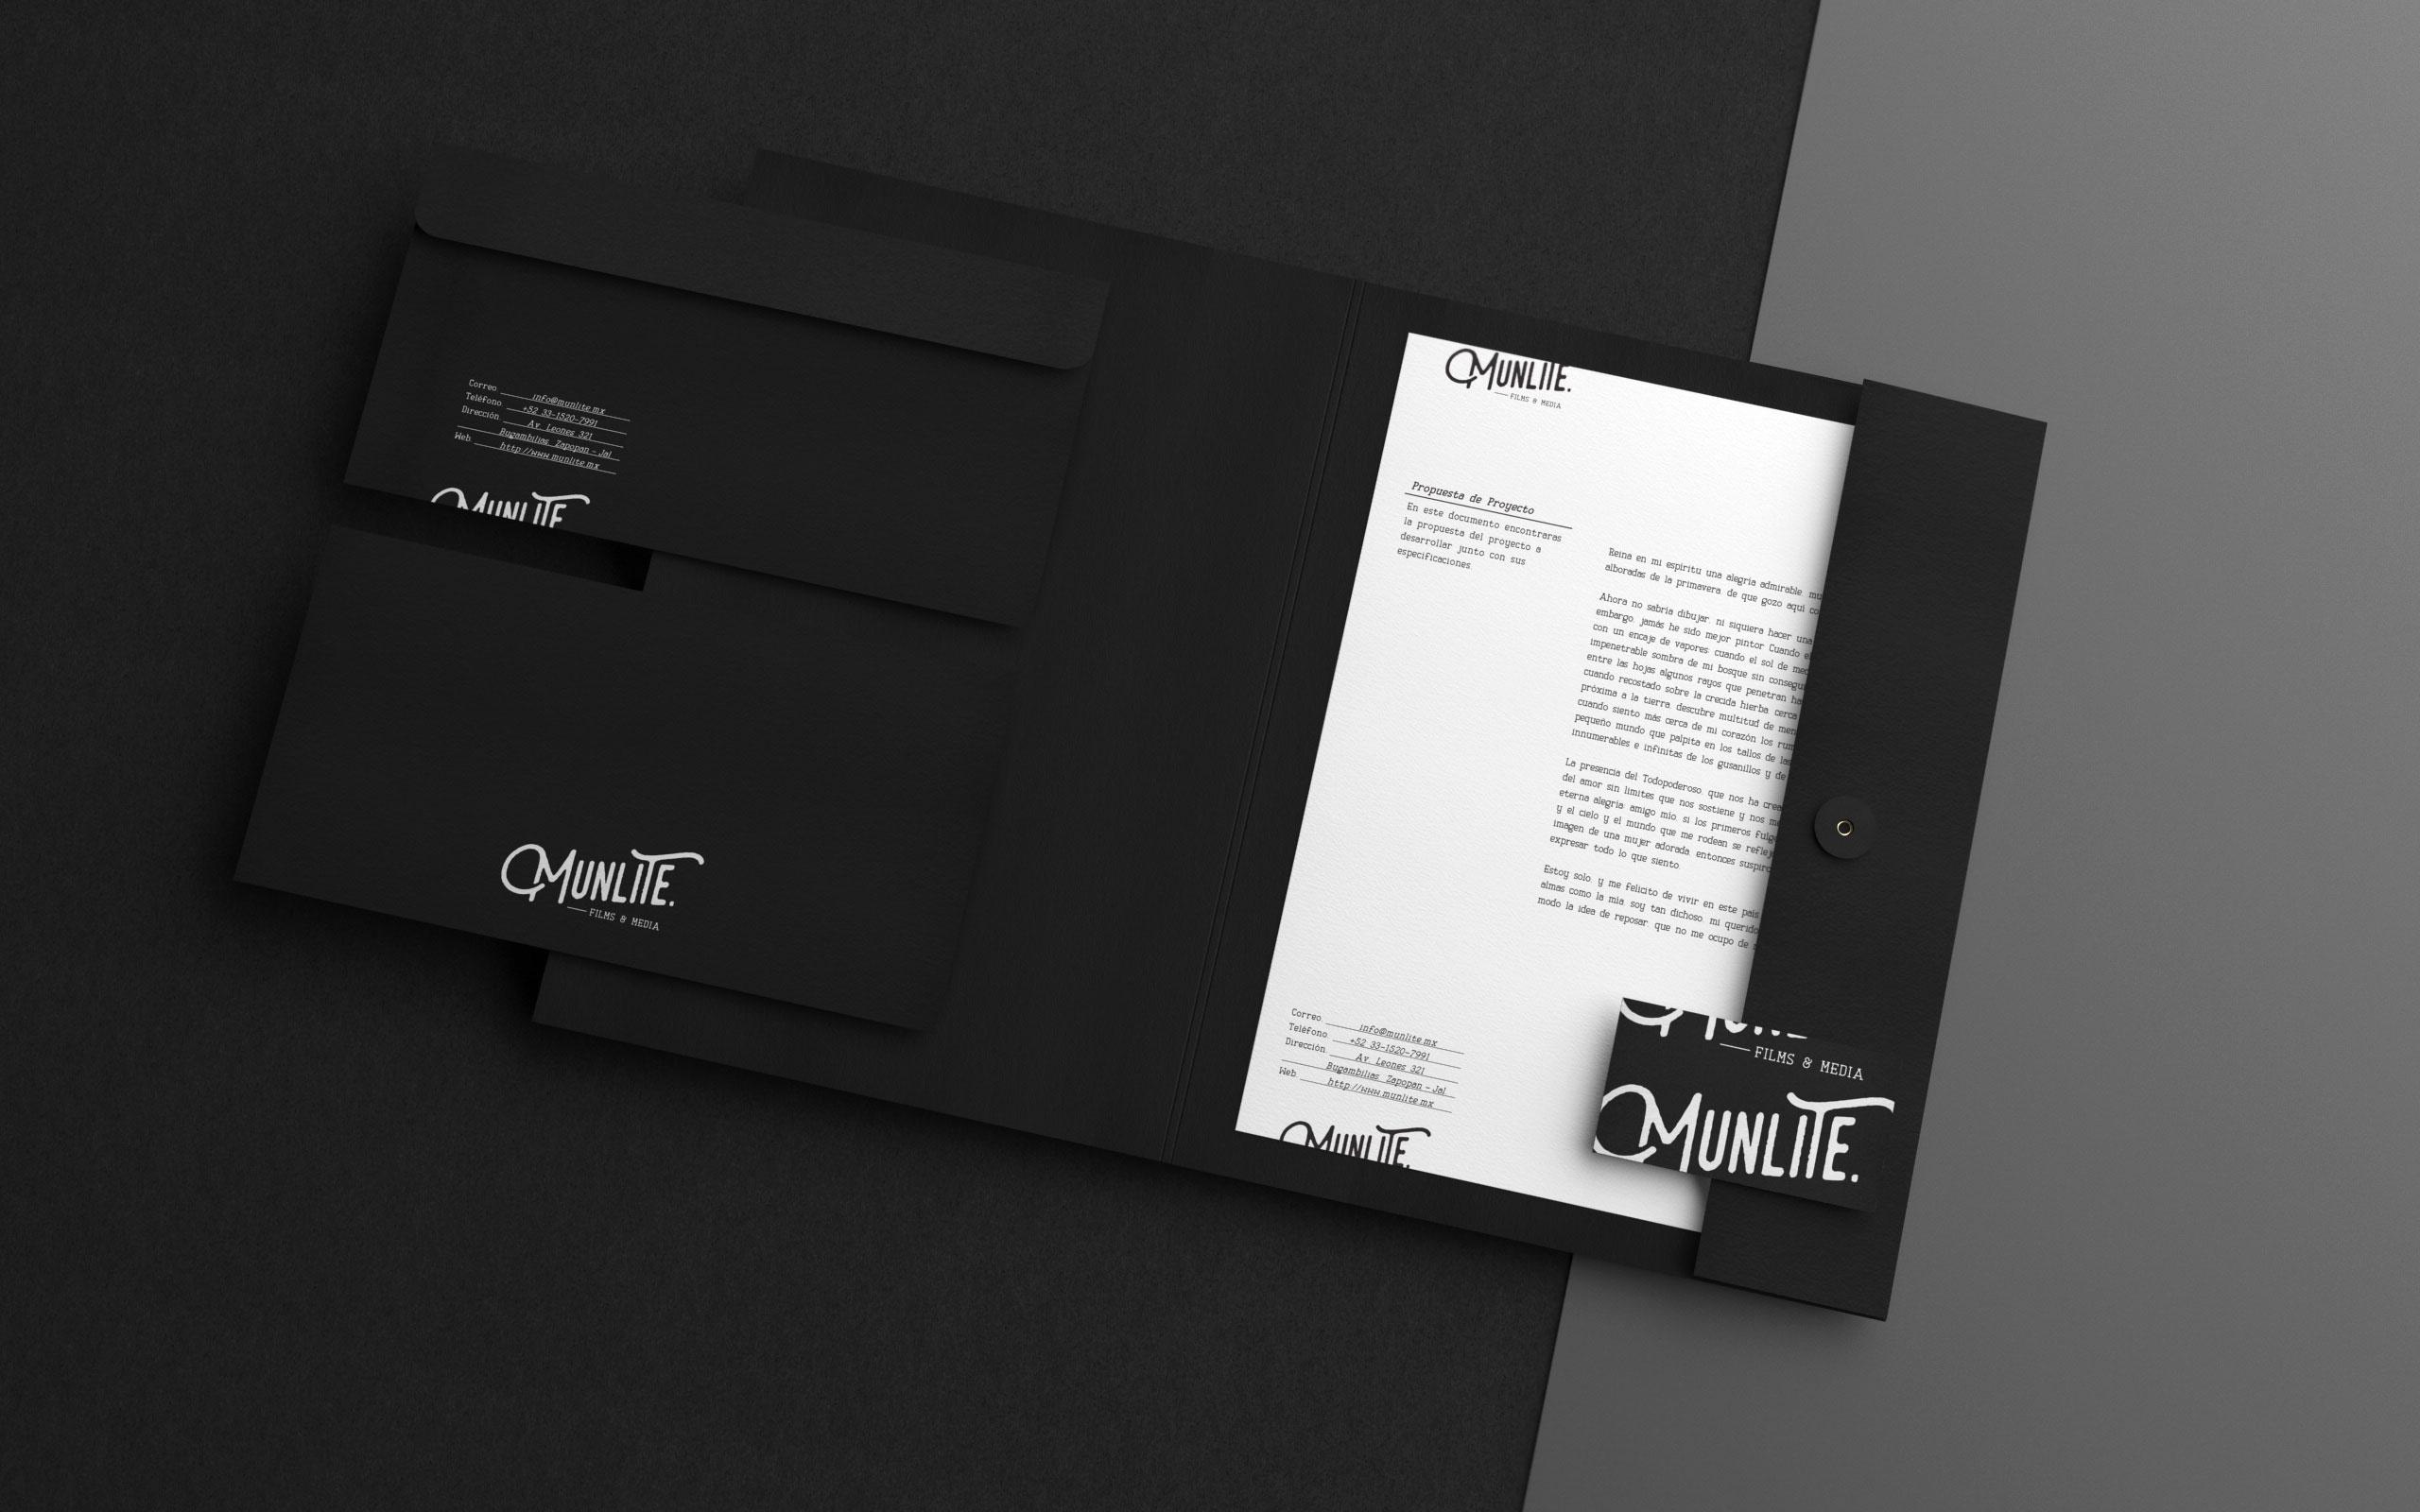 munlite-07